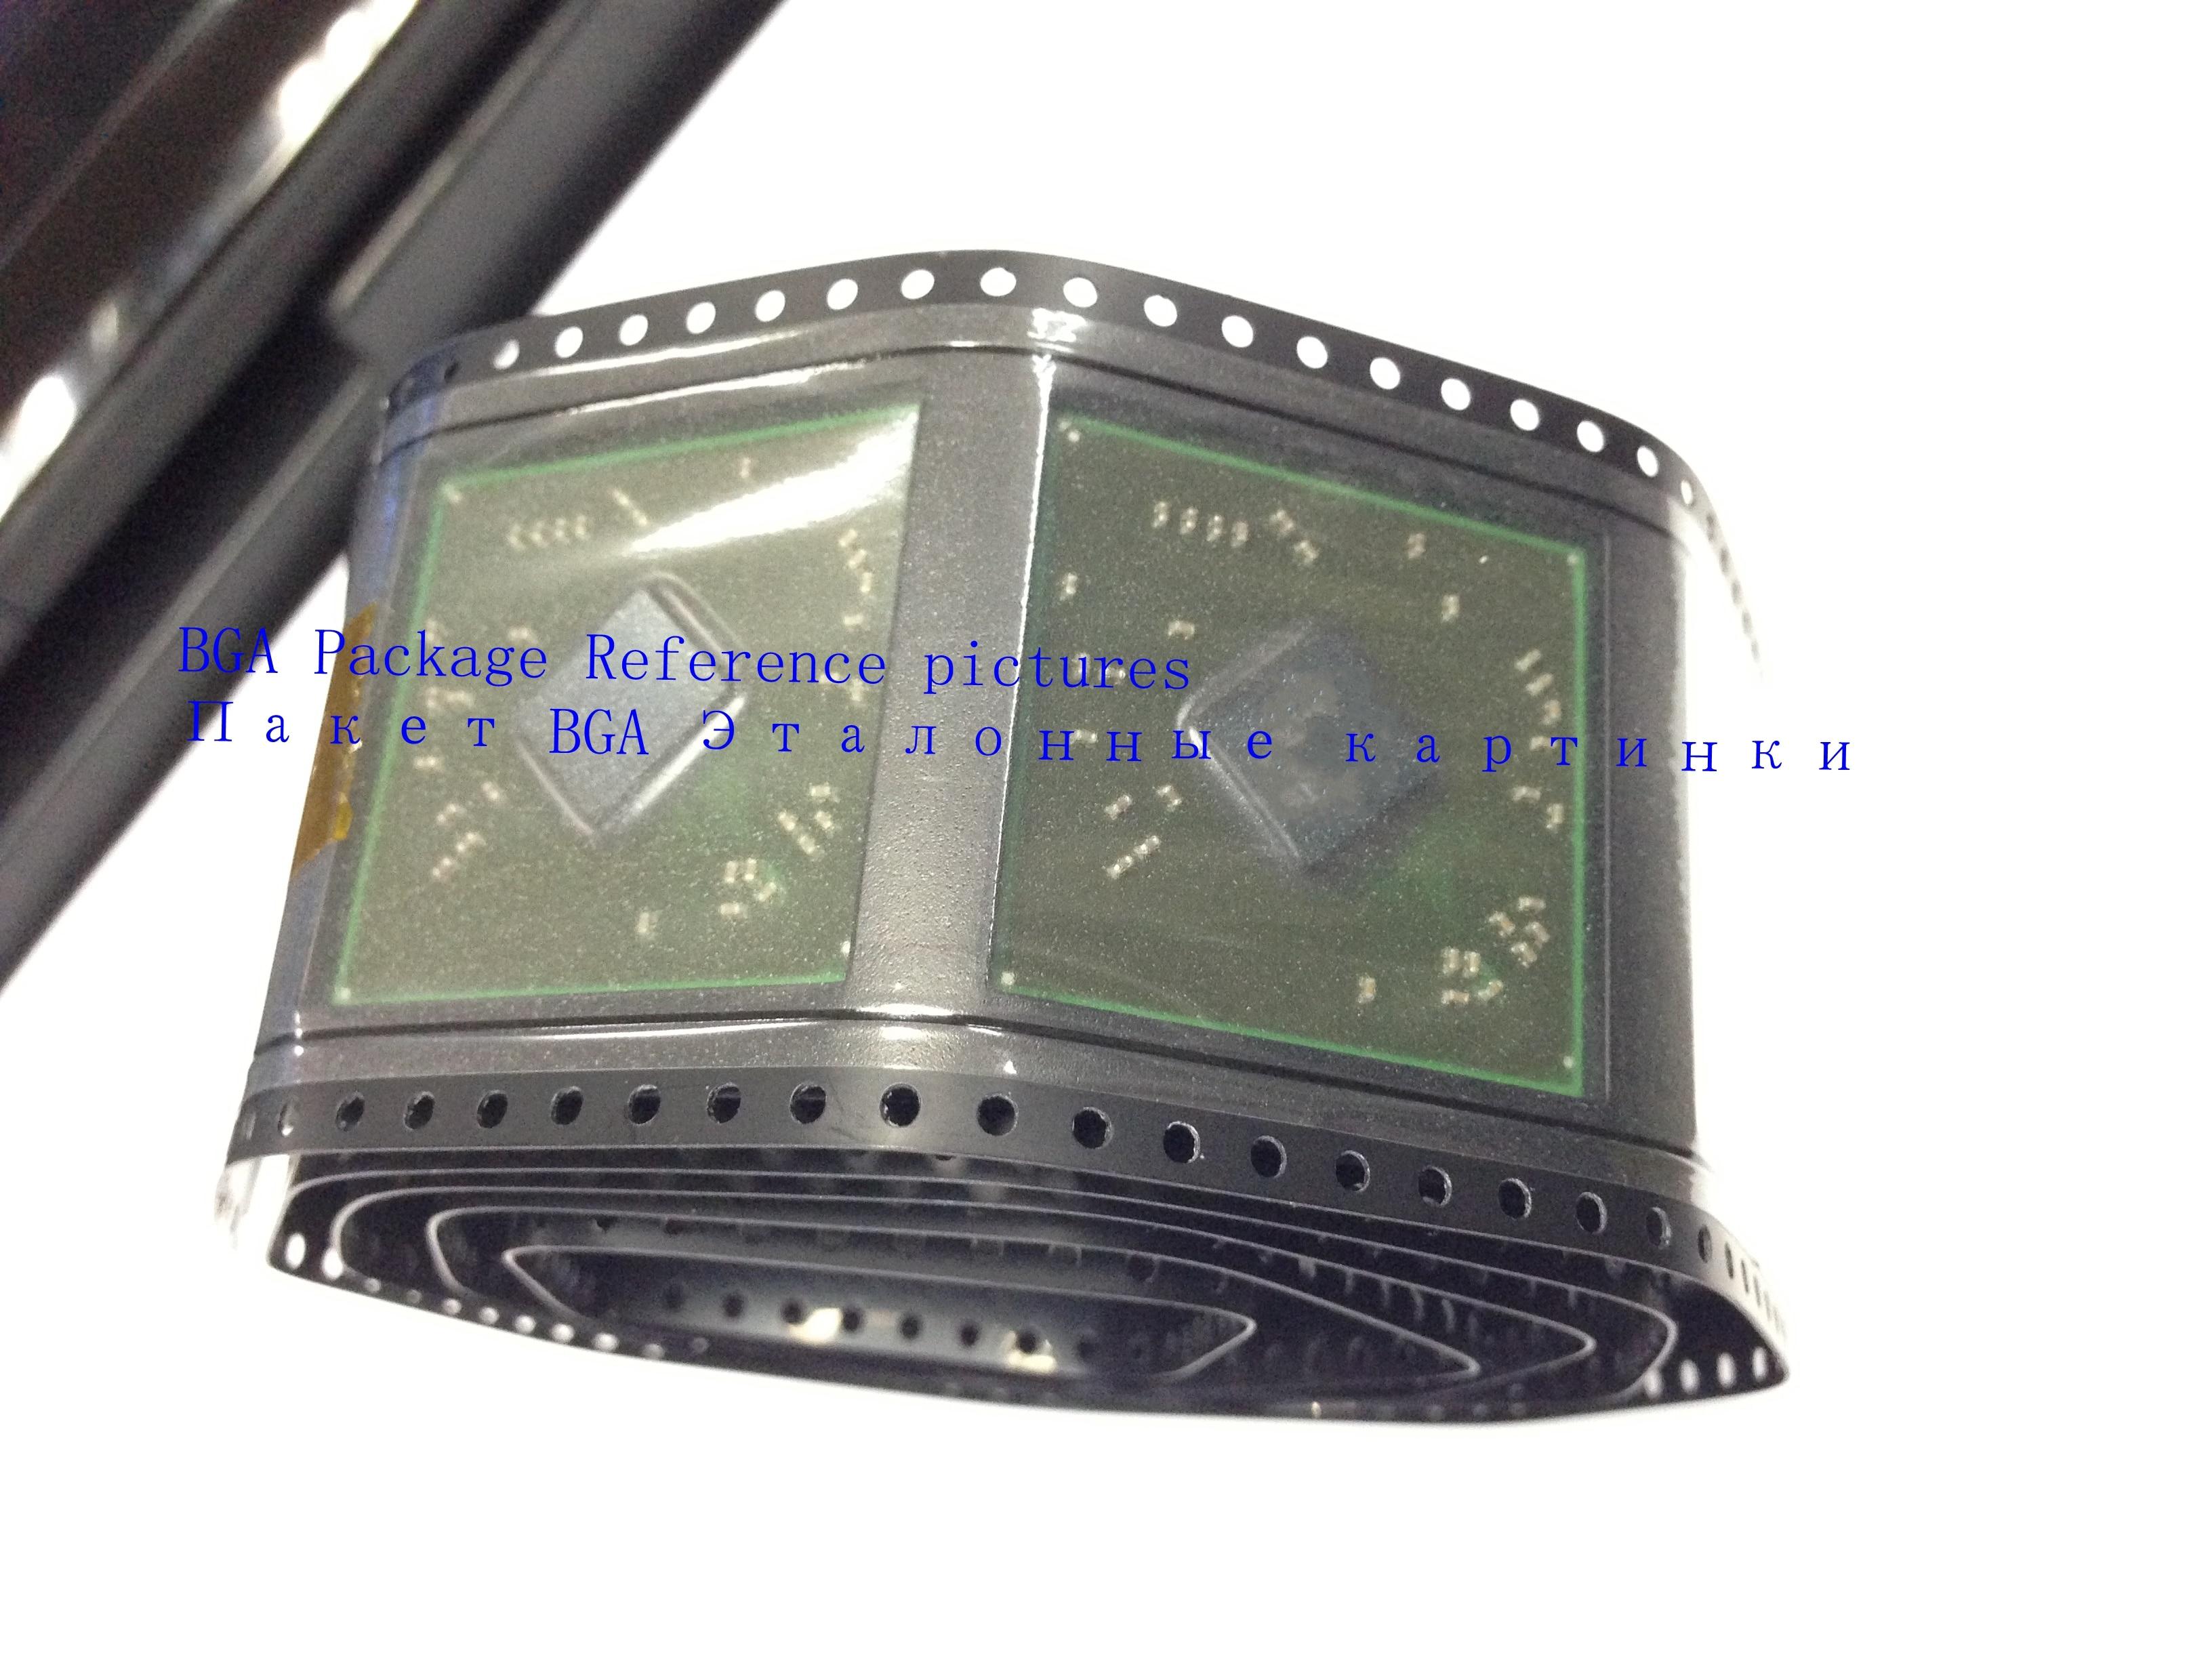 1pcs/lot 100% test very good product 216-0864018 216 0864018 bga chip reball with balls IC chips1pcs/lot 100% test very good product 216-0864018 216 0864018 bga chip reball with balls IC chips